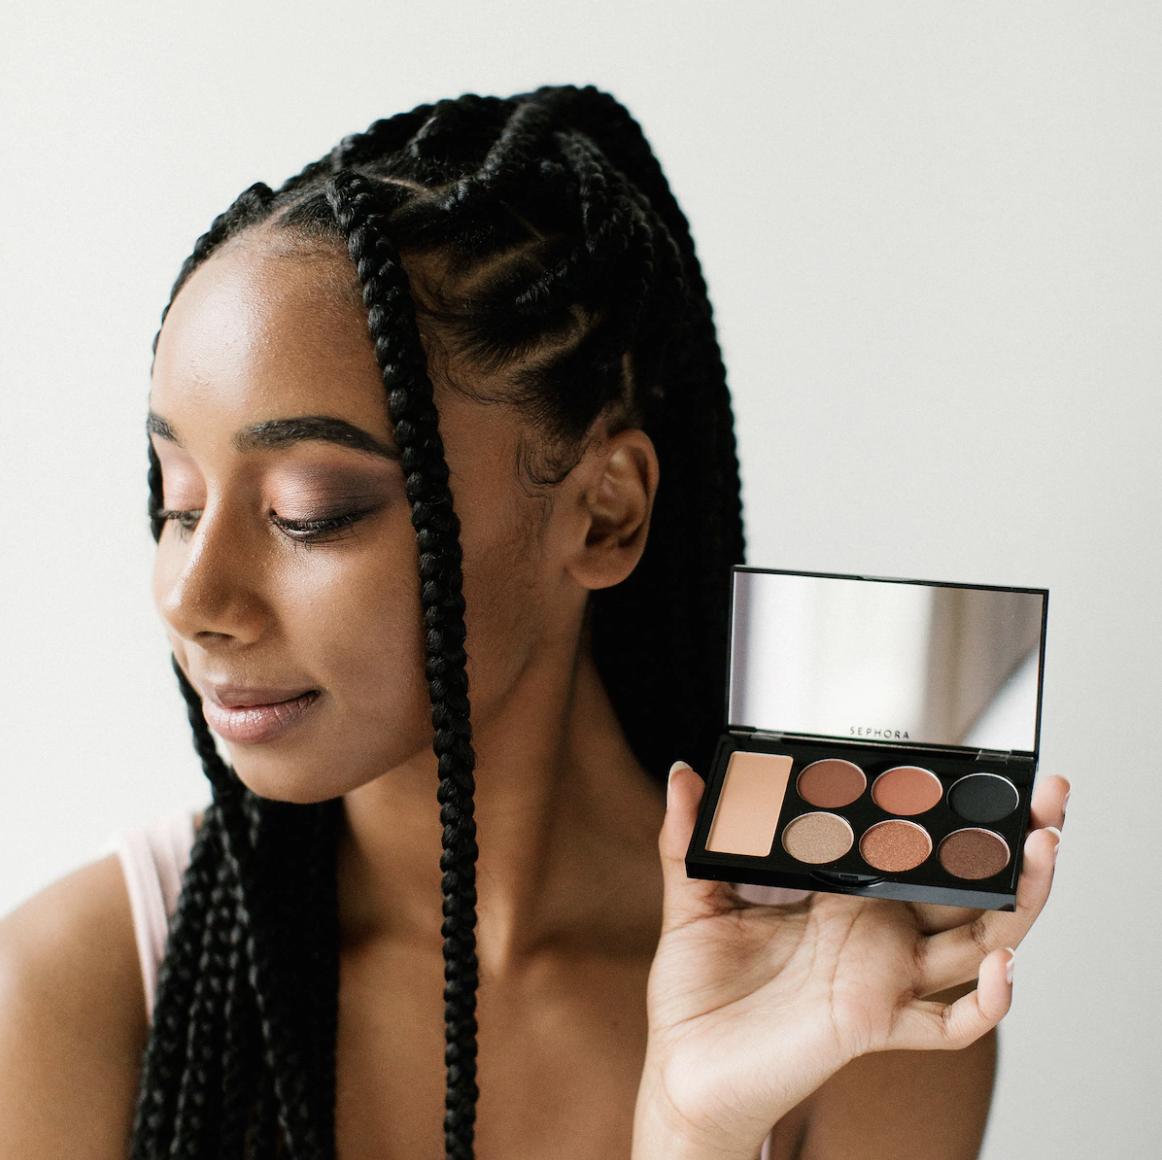 girl holding up eyeshadow palette